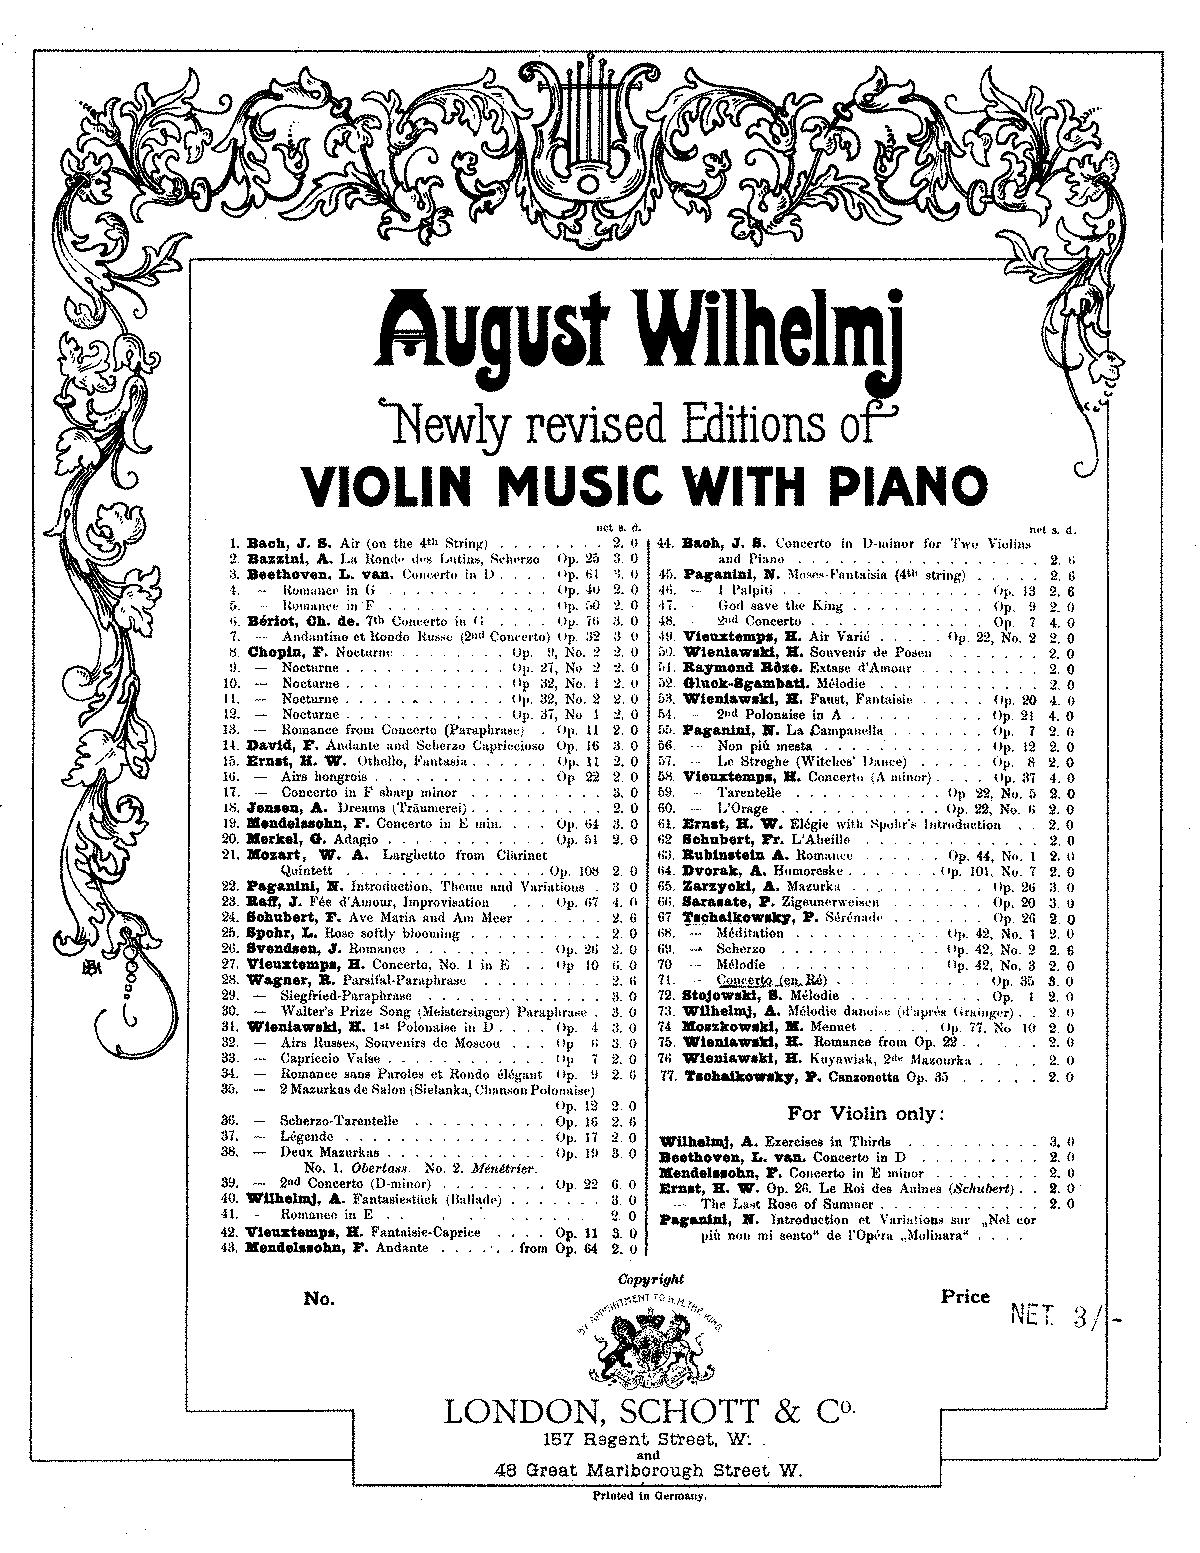 Tchaikovsky research paper